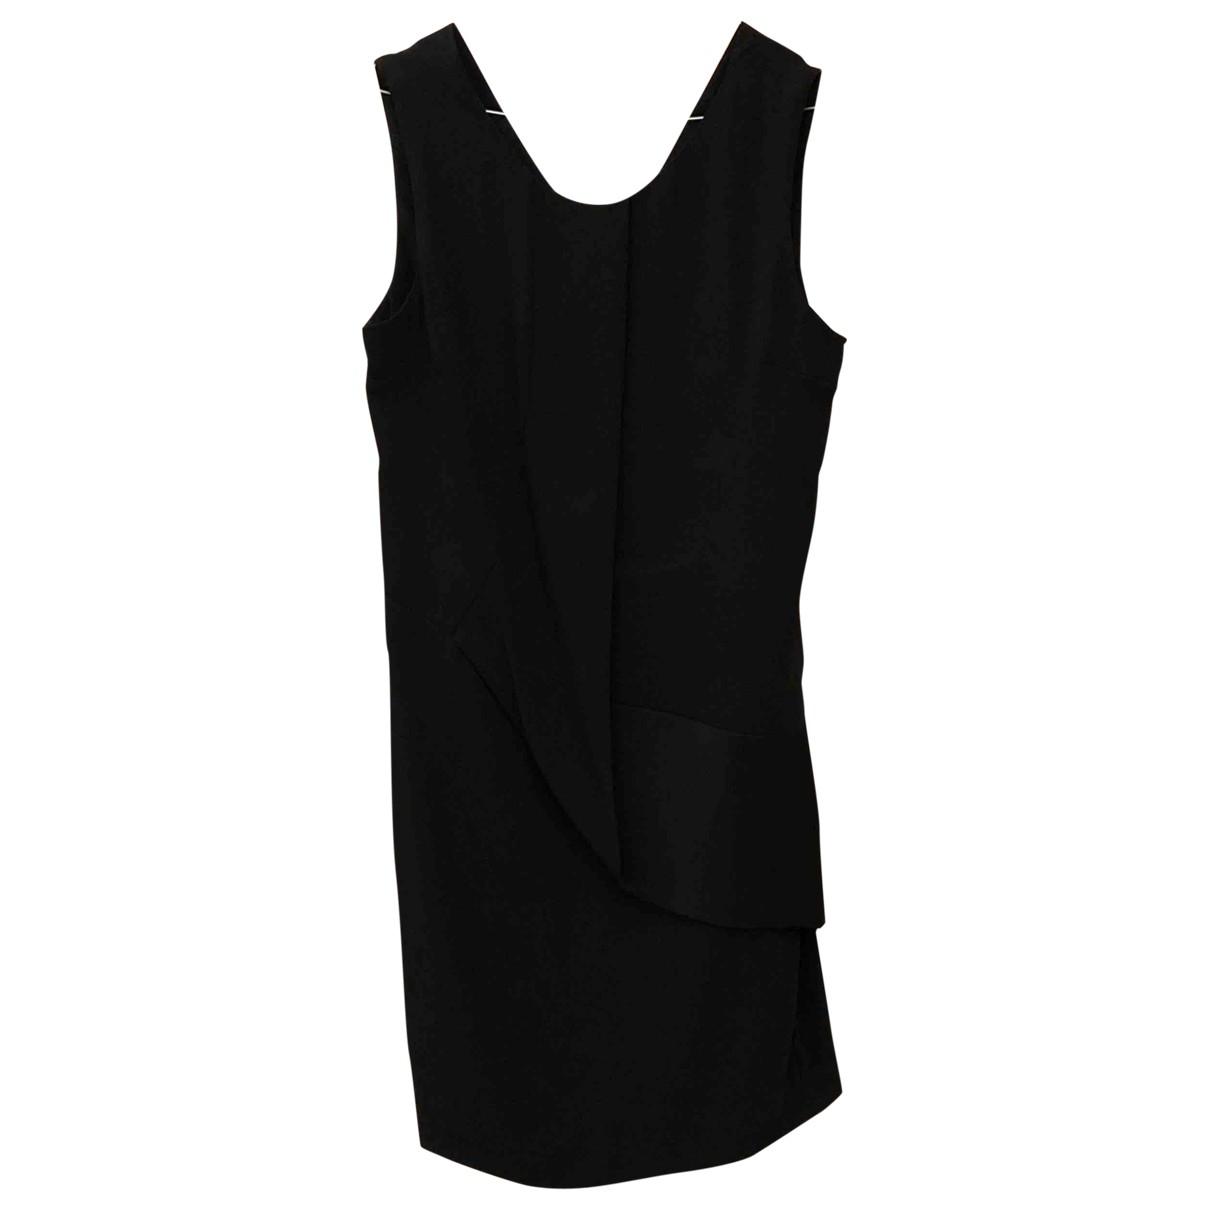 Armani Jeans \N Kleid in  Schwarz Polyester